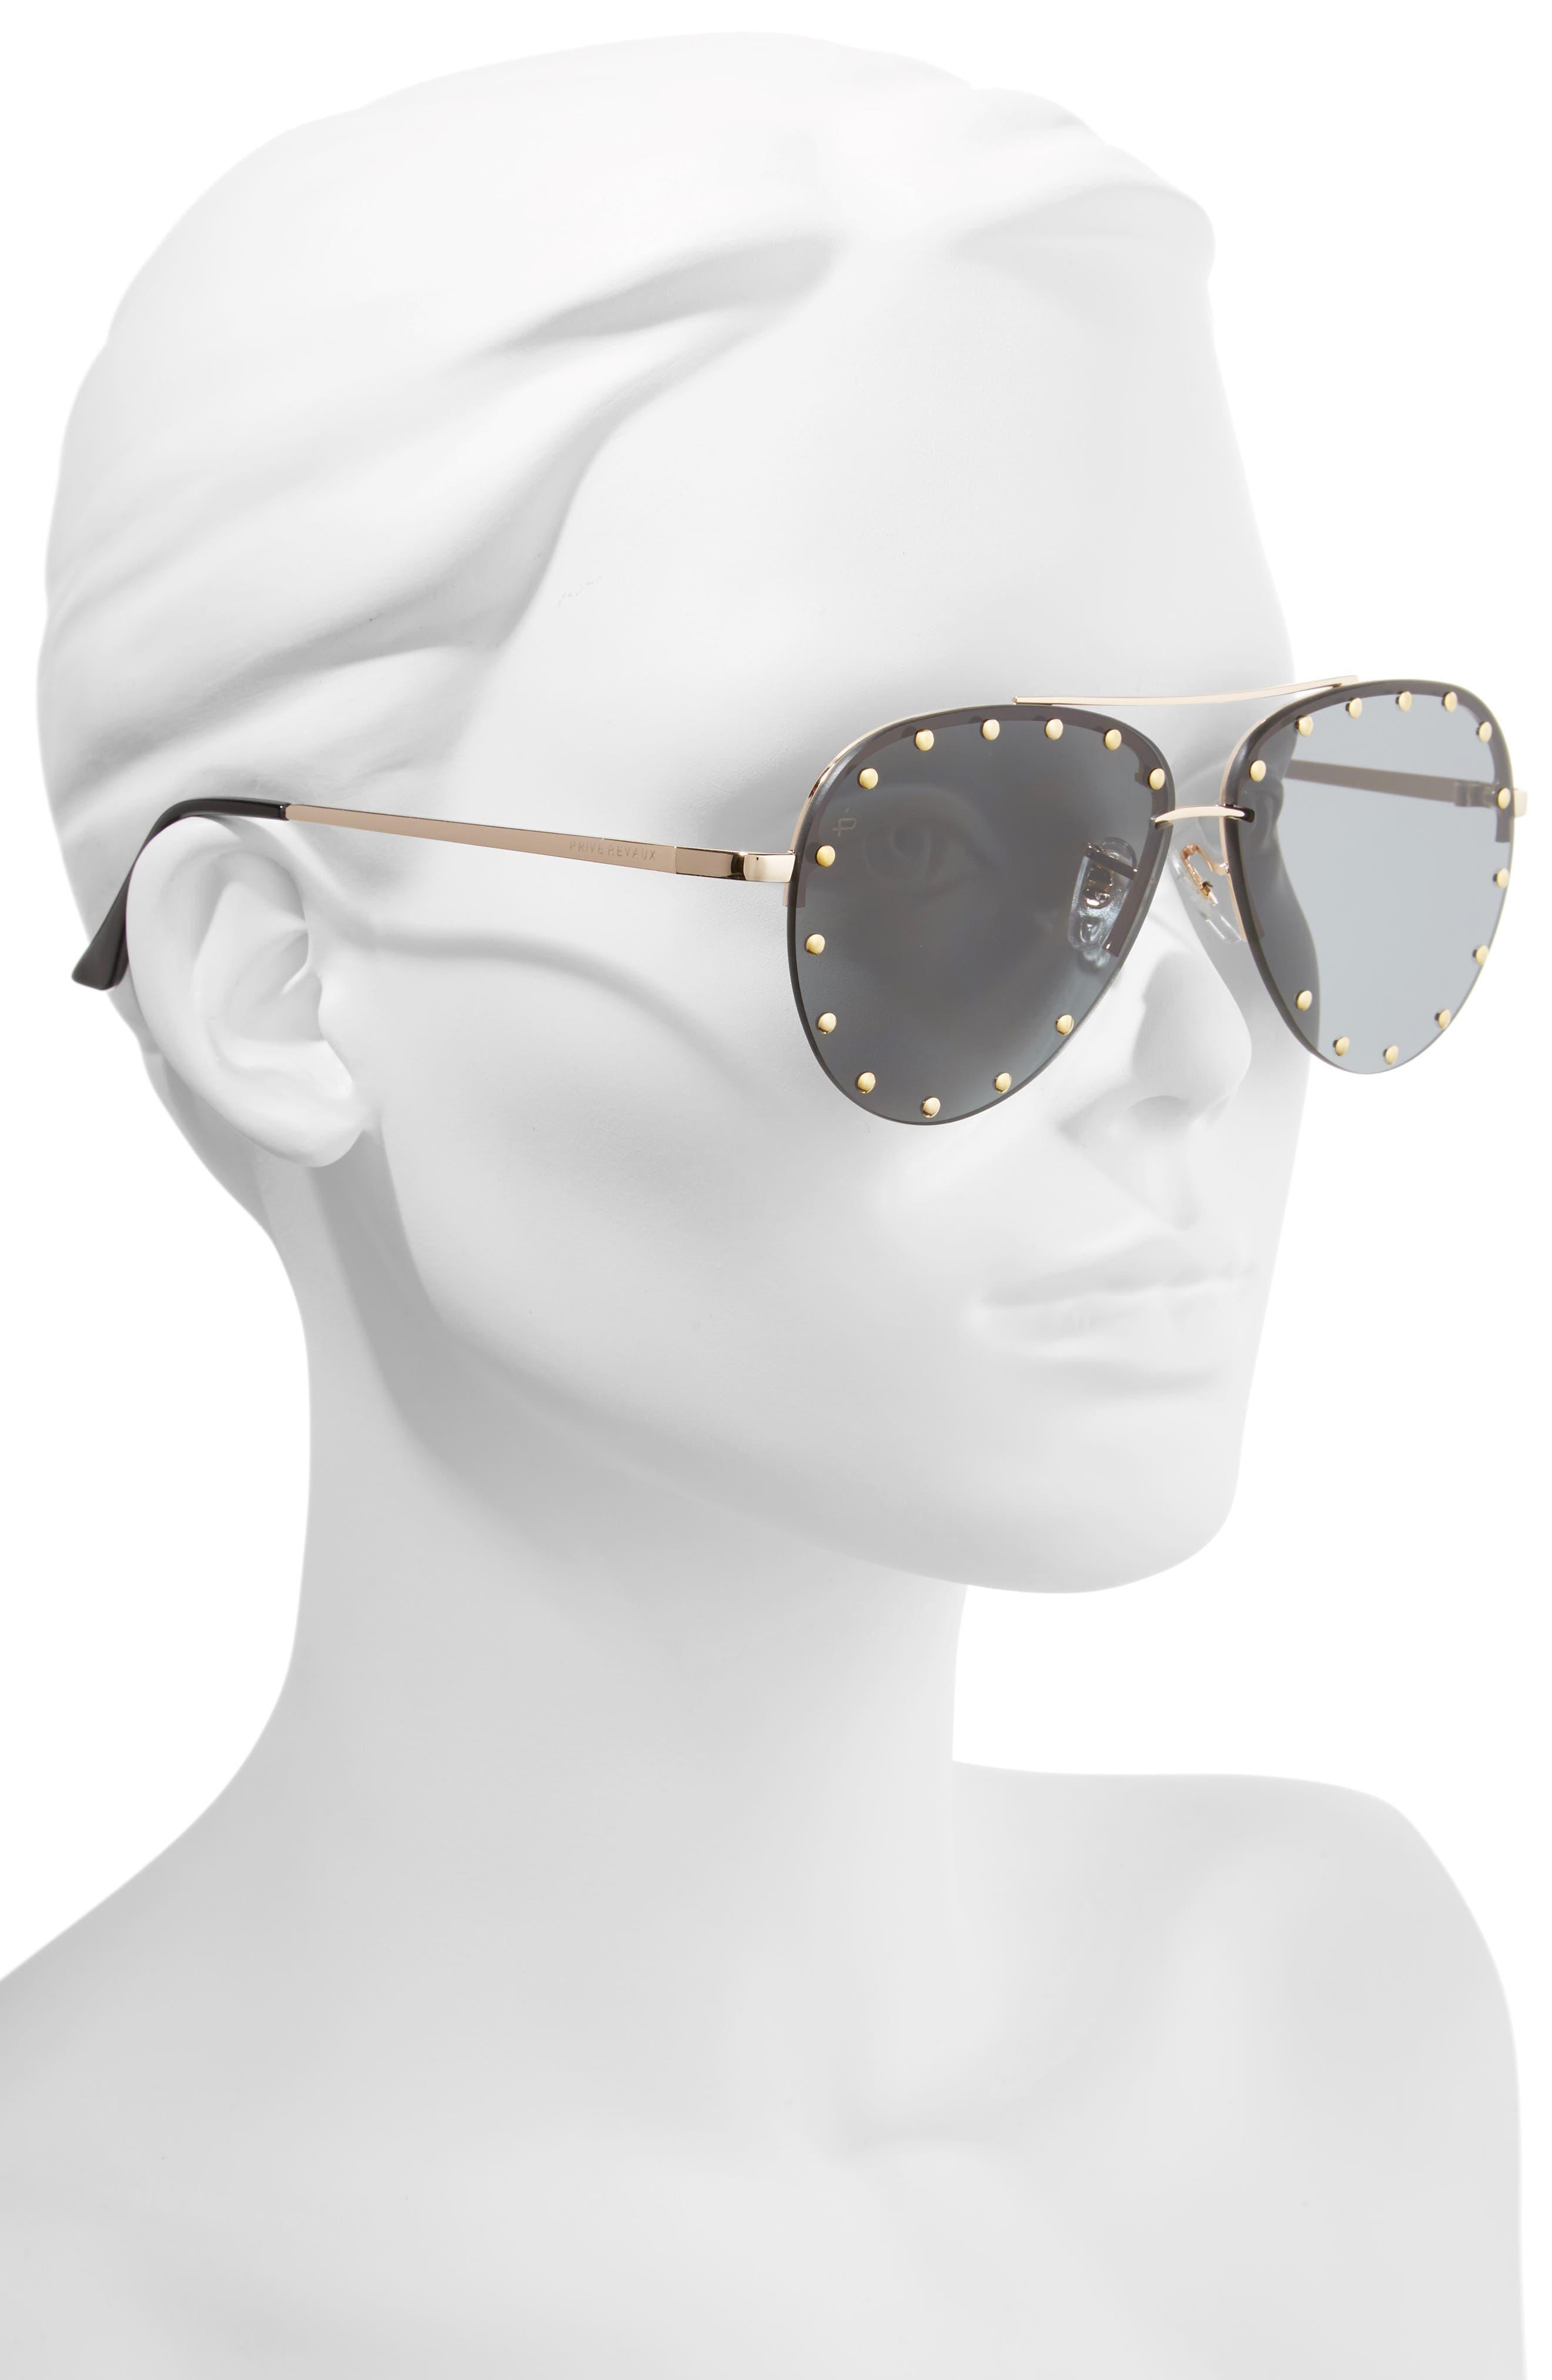 Privé Revaux The Sixth Man 60mm Studded Aviator Sunglasses,                             Alternate thumbnail 2, color,                             001